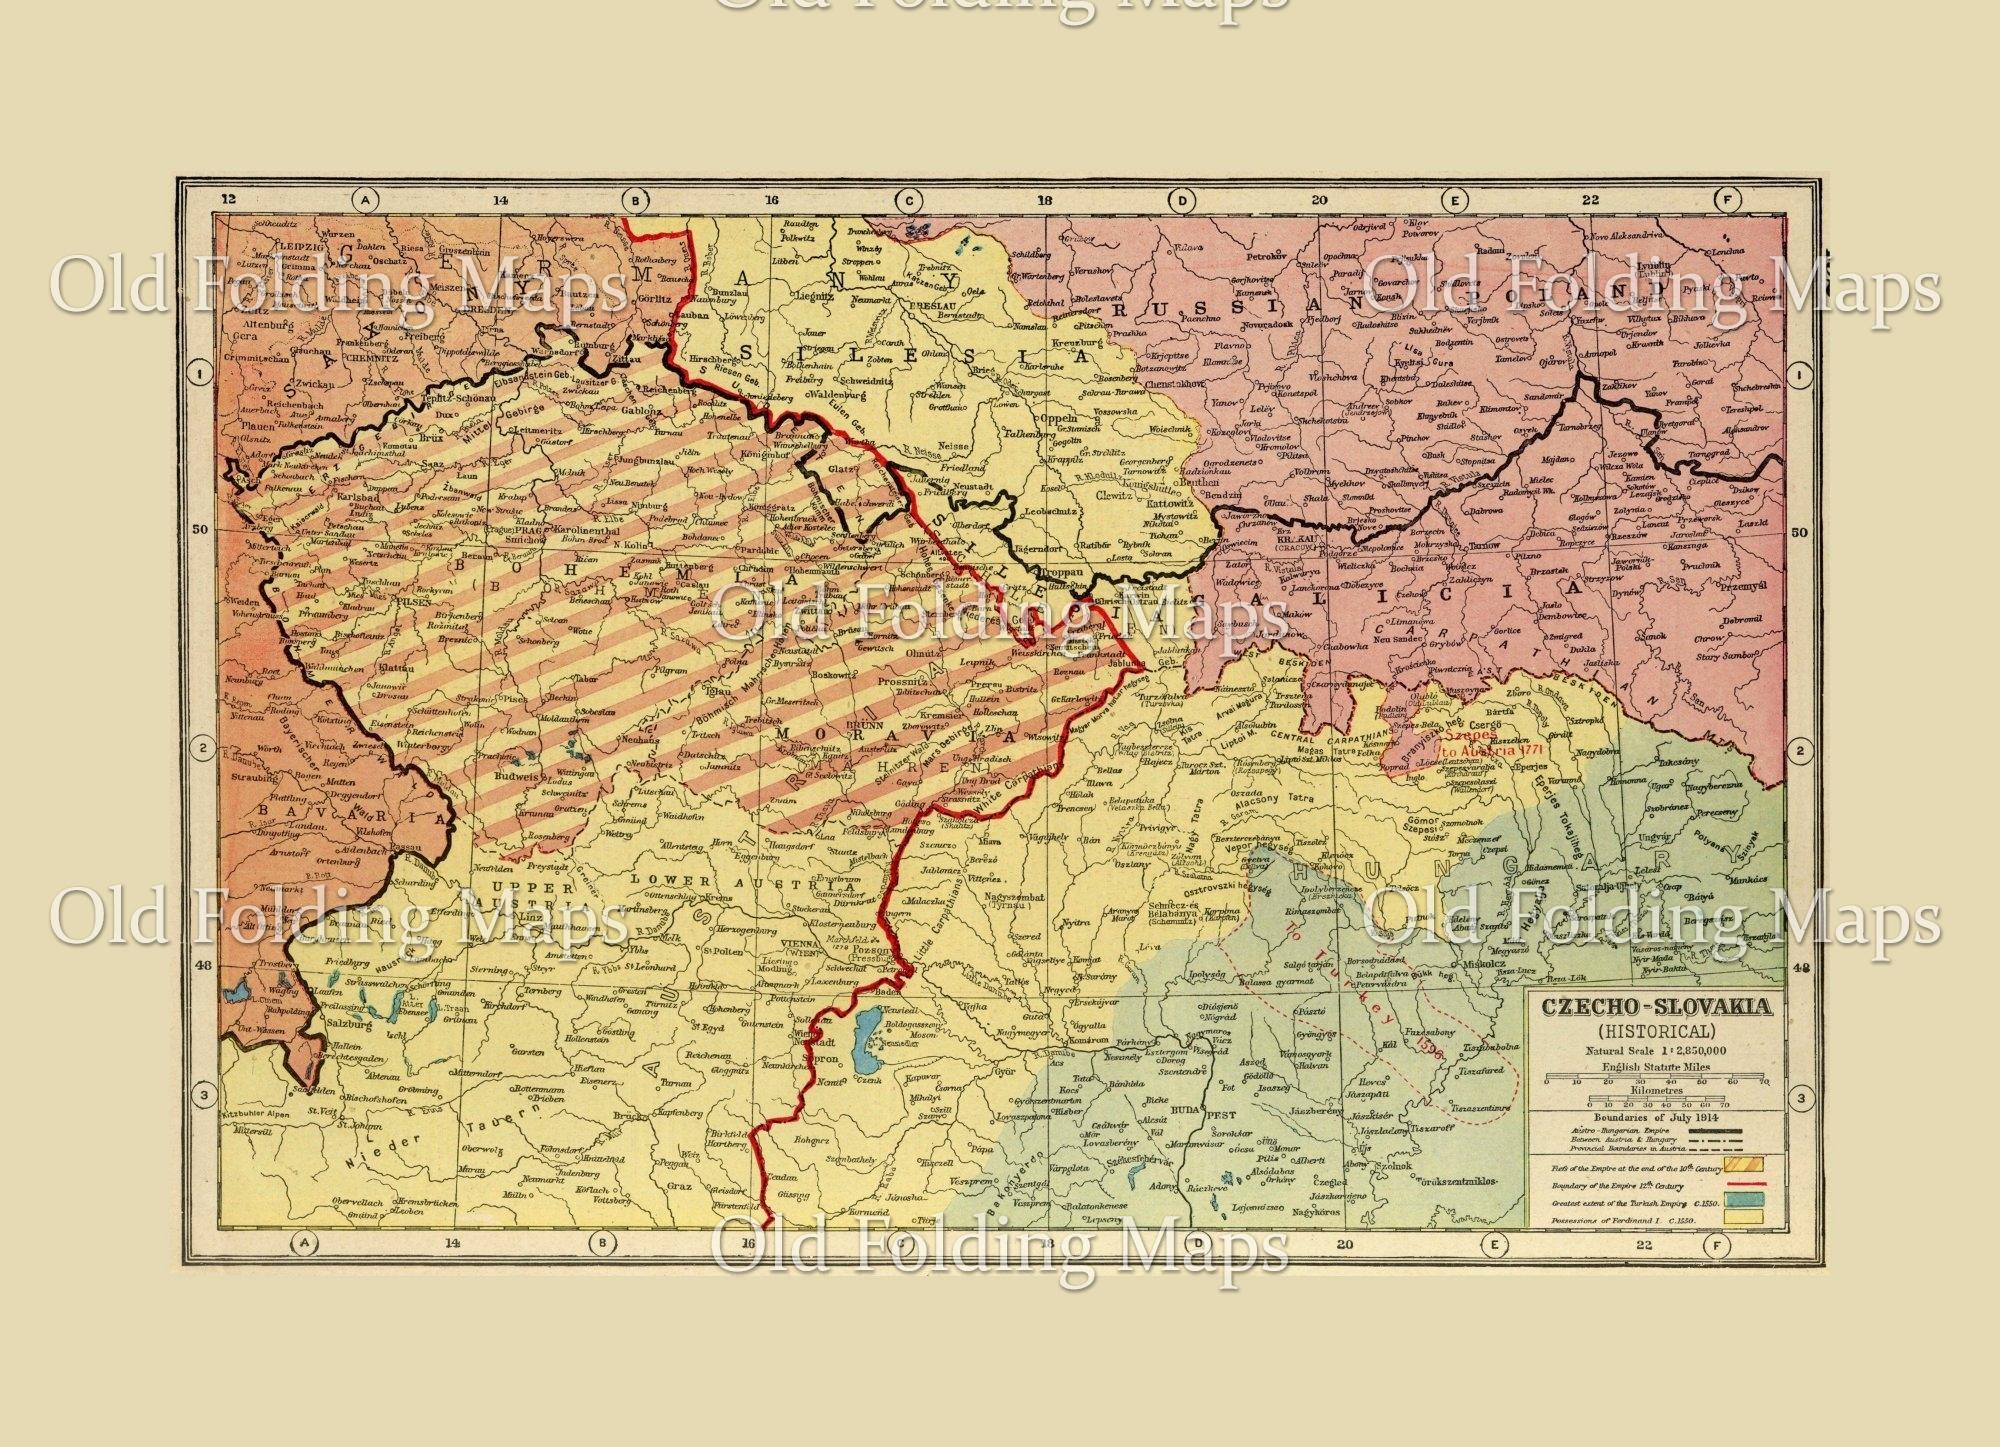 World War One map of Czecho-Slovakia - 1914